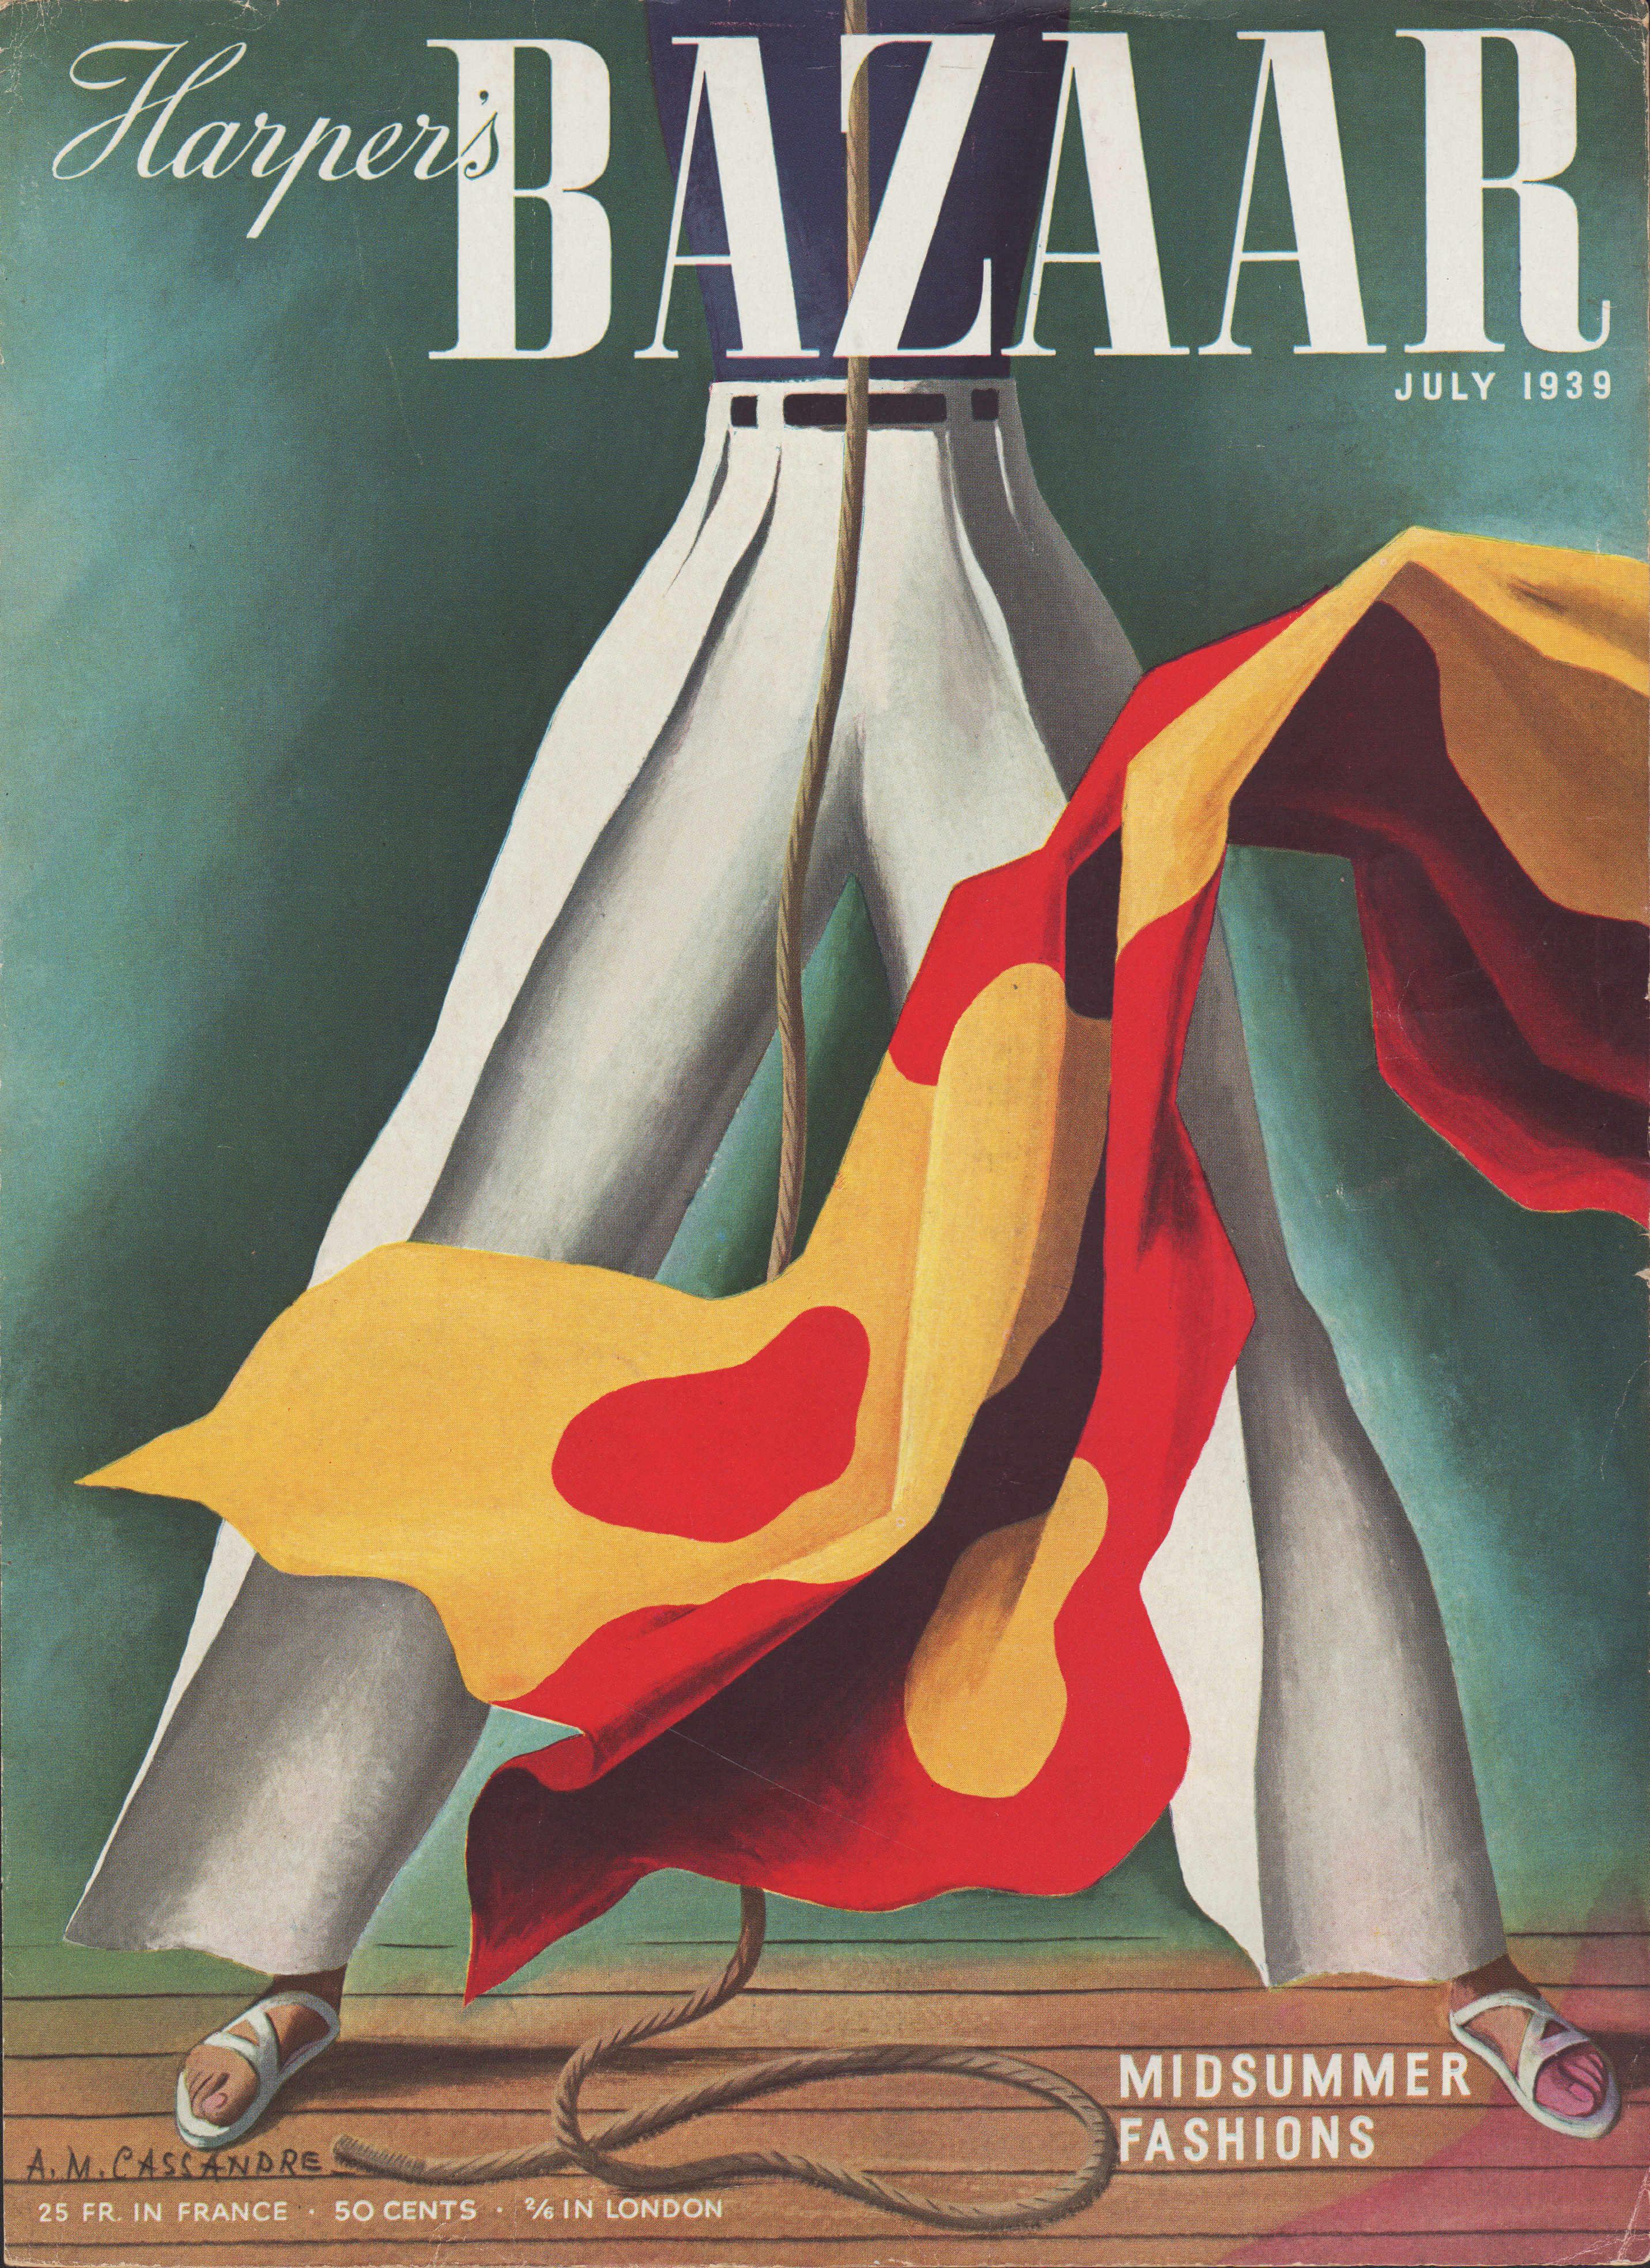 Portada Harpers Bazaar Julio 1939 diseñada por AM Cassandre